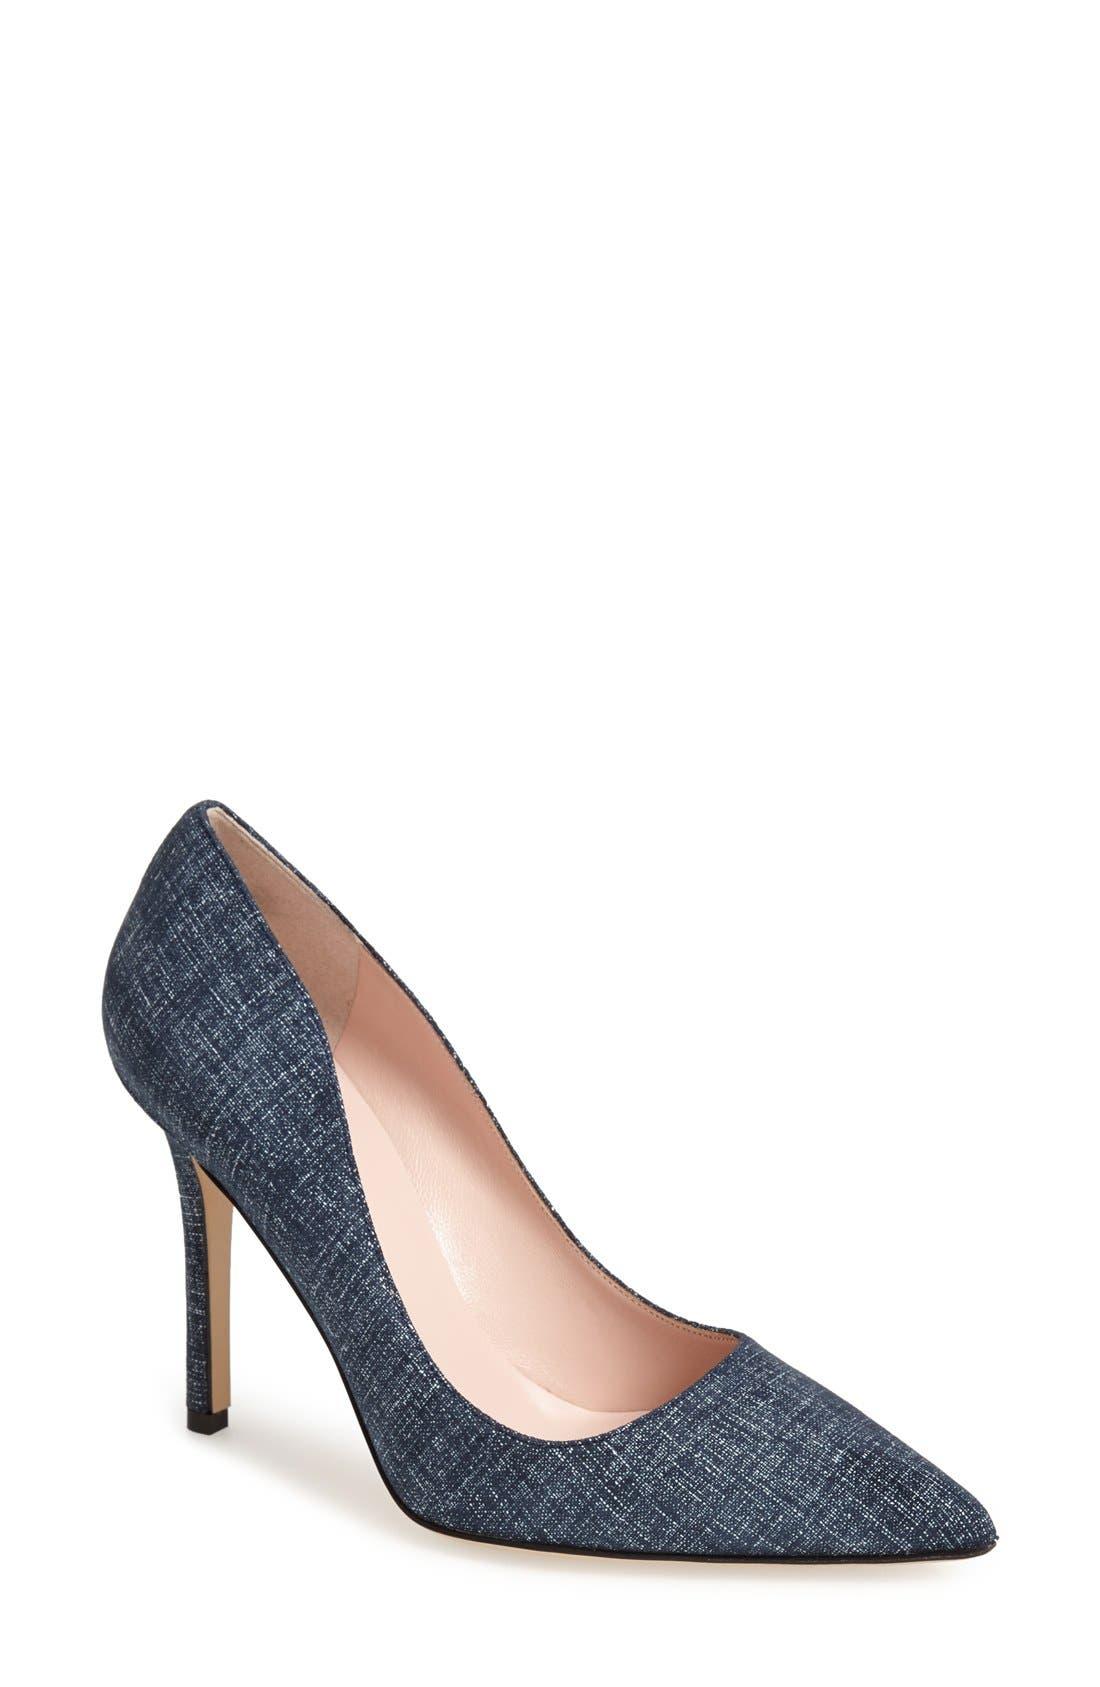 Alternate Image 1 Selected - kate spade new york 'larisa' pointy toe pump (Women)